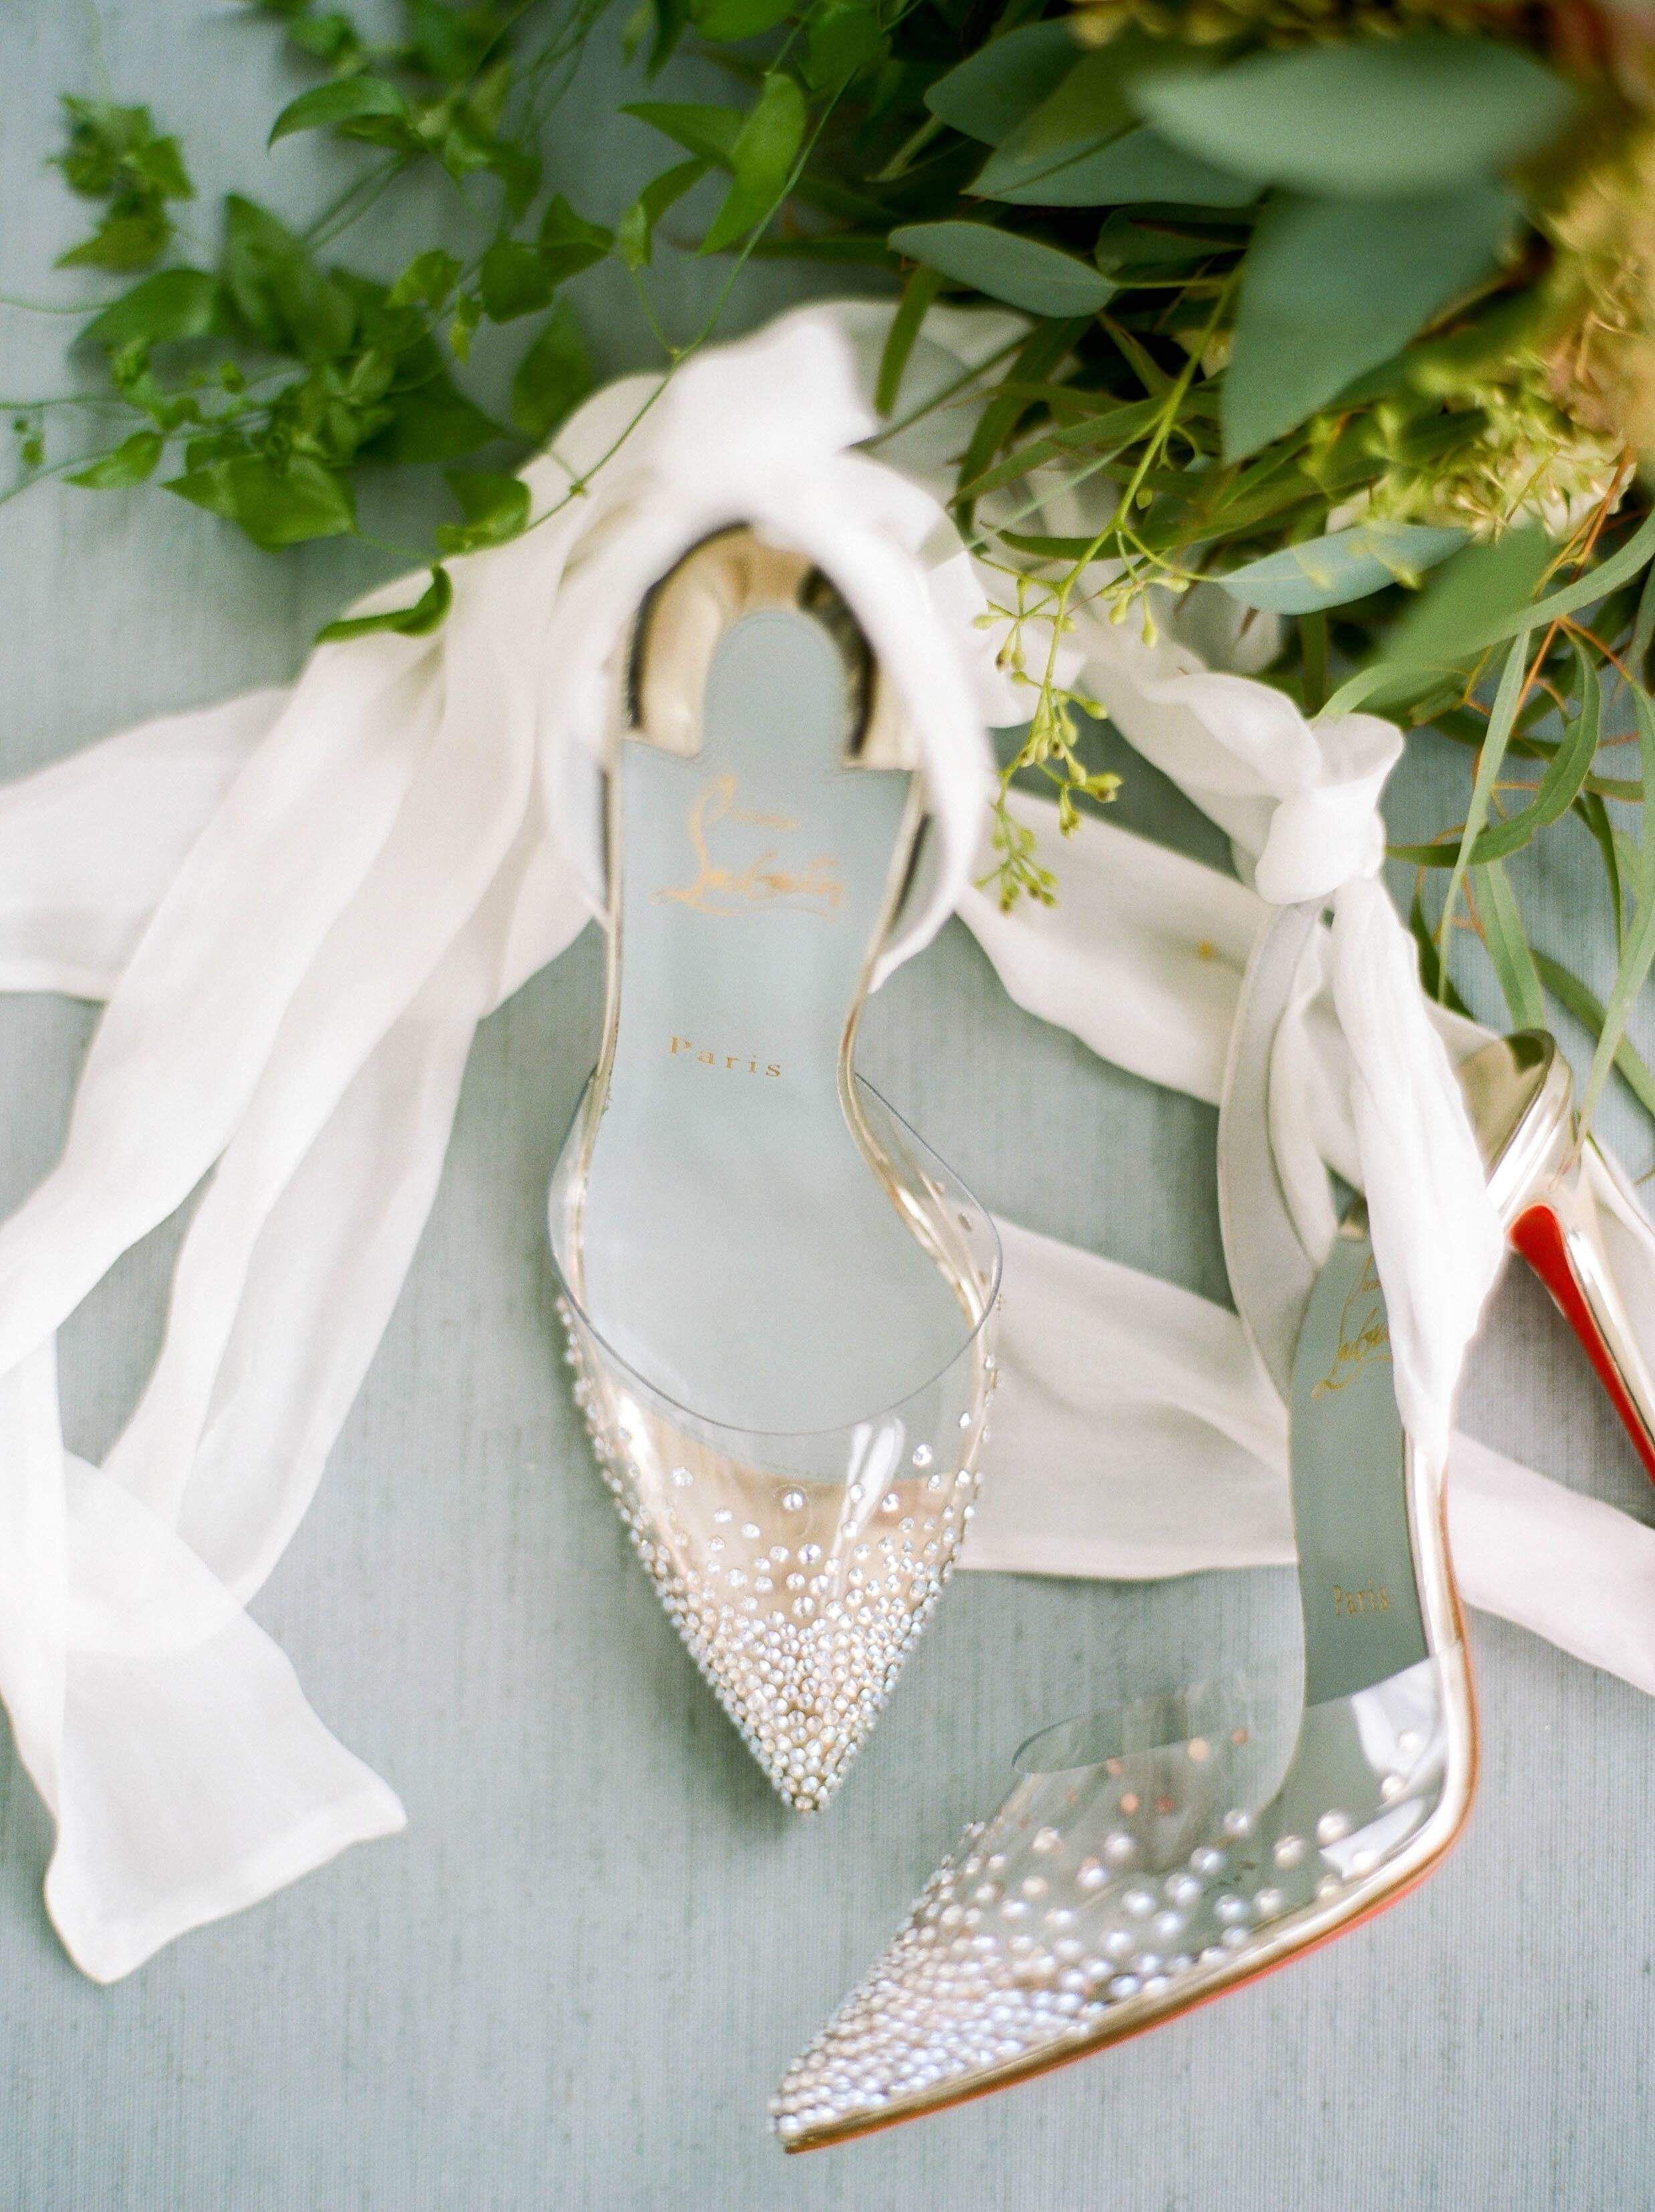 Louboutin Wedding Shoes Christian Louboutin Louboutin Shoes Wedding Shoes Weddin Christian Louboutin Wedding Shoes Louboutin Wedding Shoes Shoe Inspiration